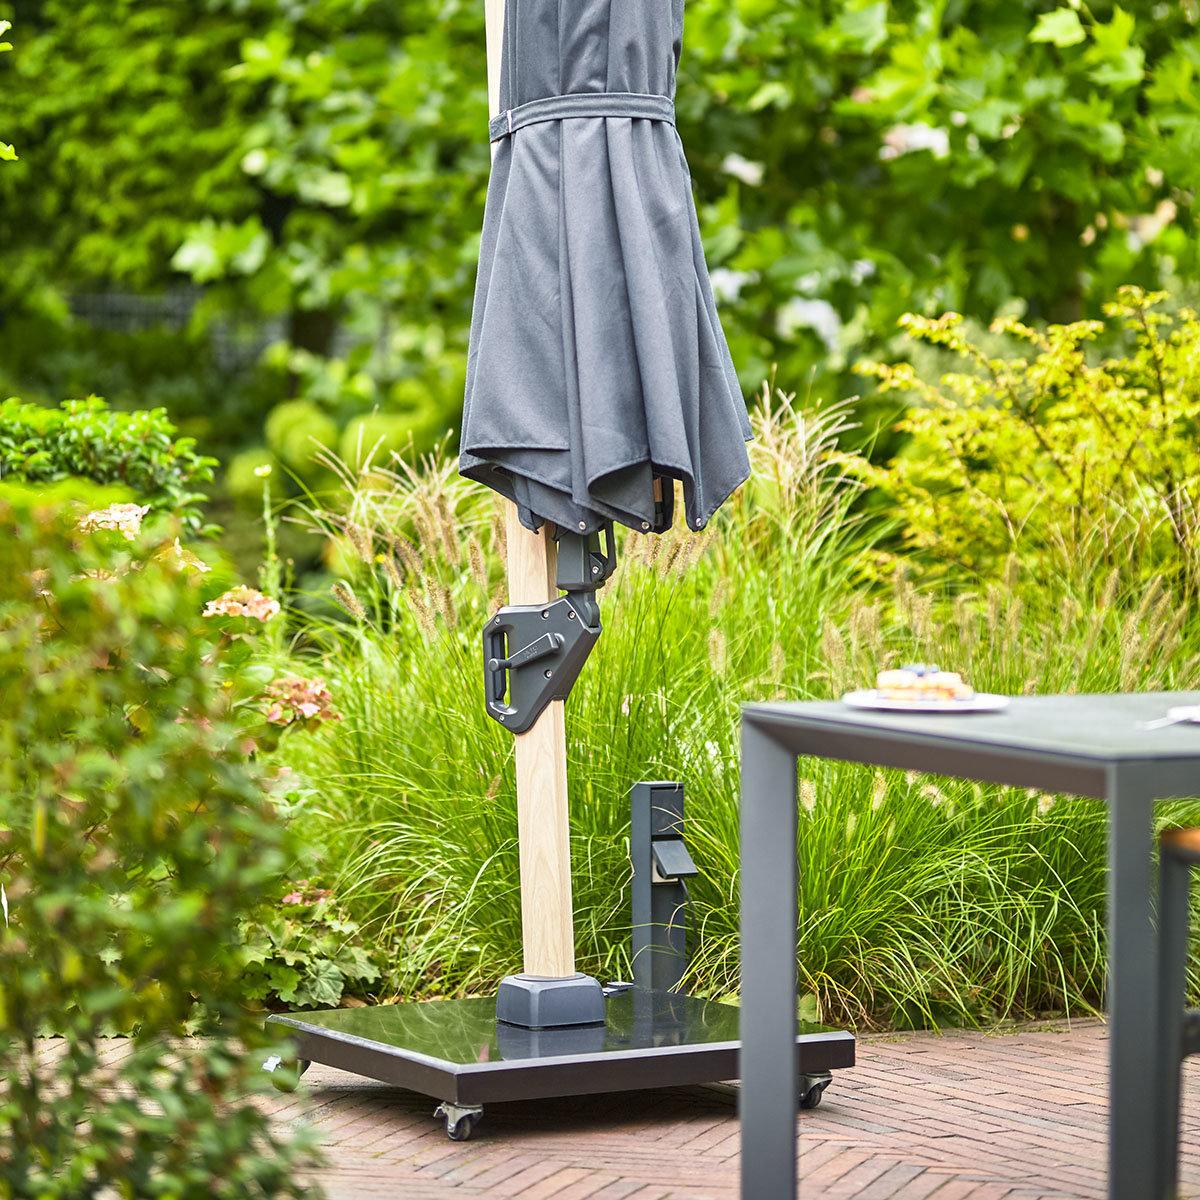 Granit-Schirmständer mit Lenkrollen, ca 90 kg | #5